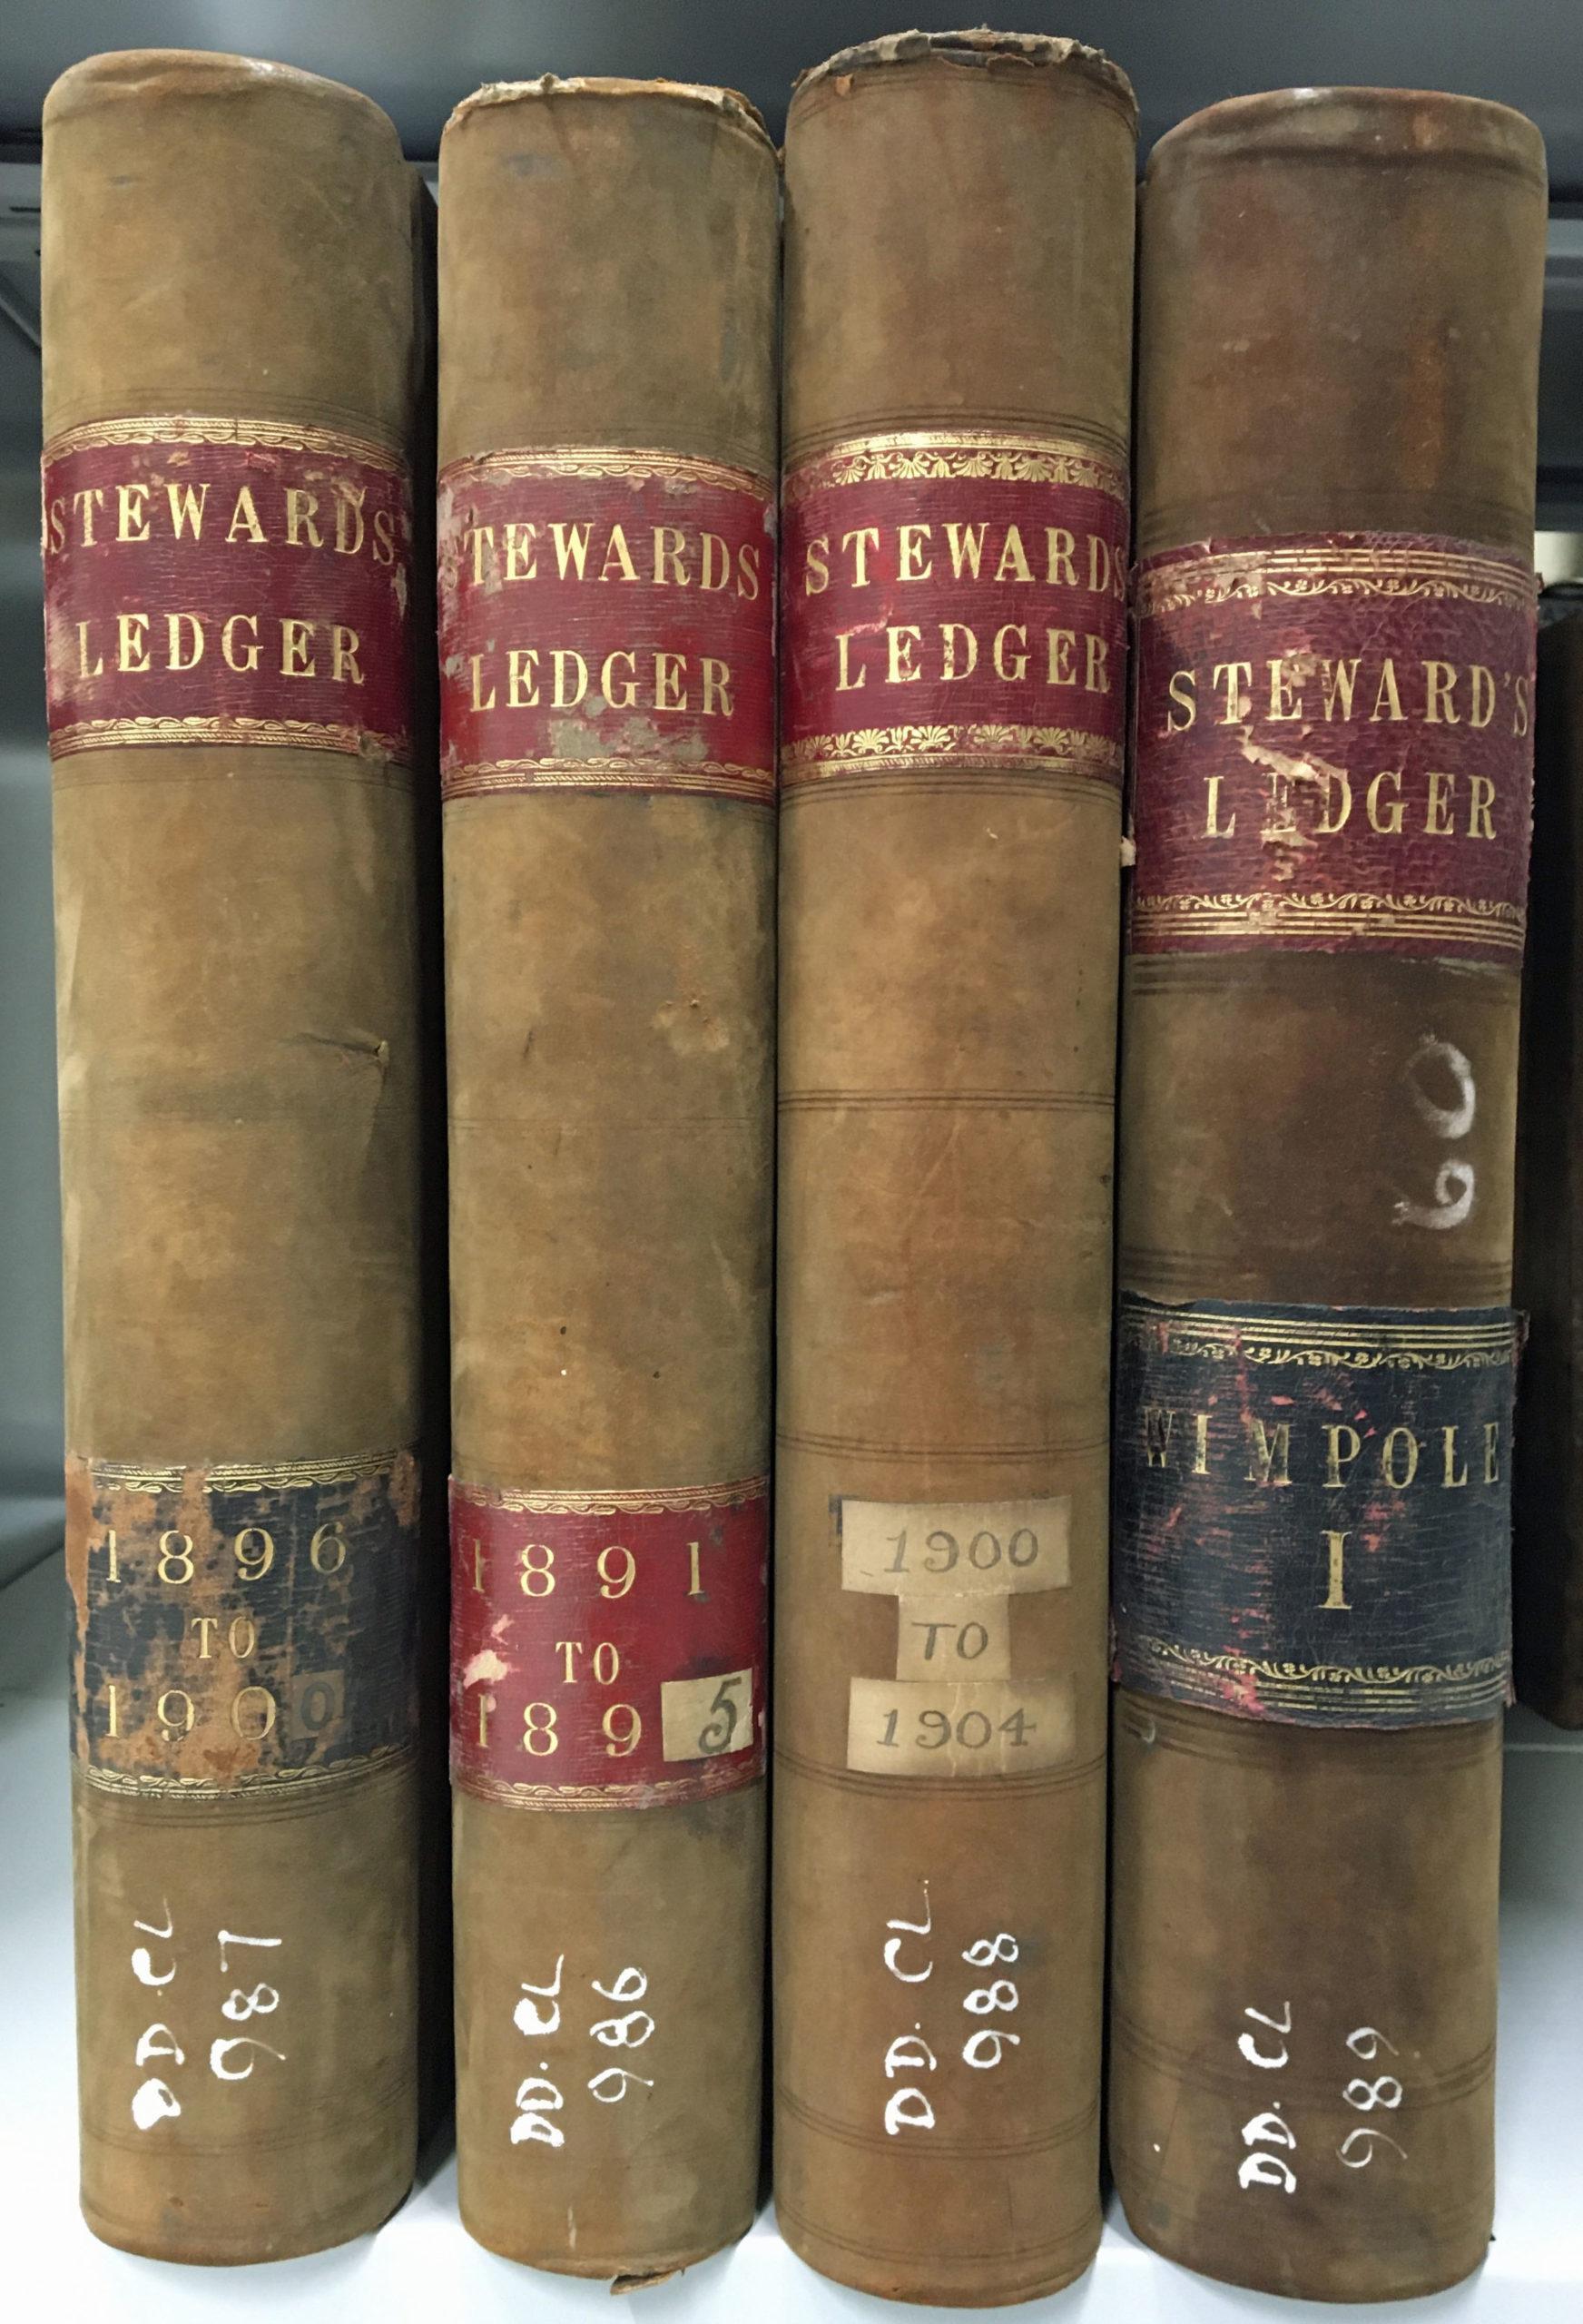 Colour photograph of books.